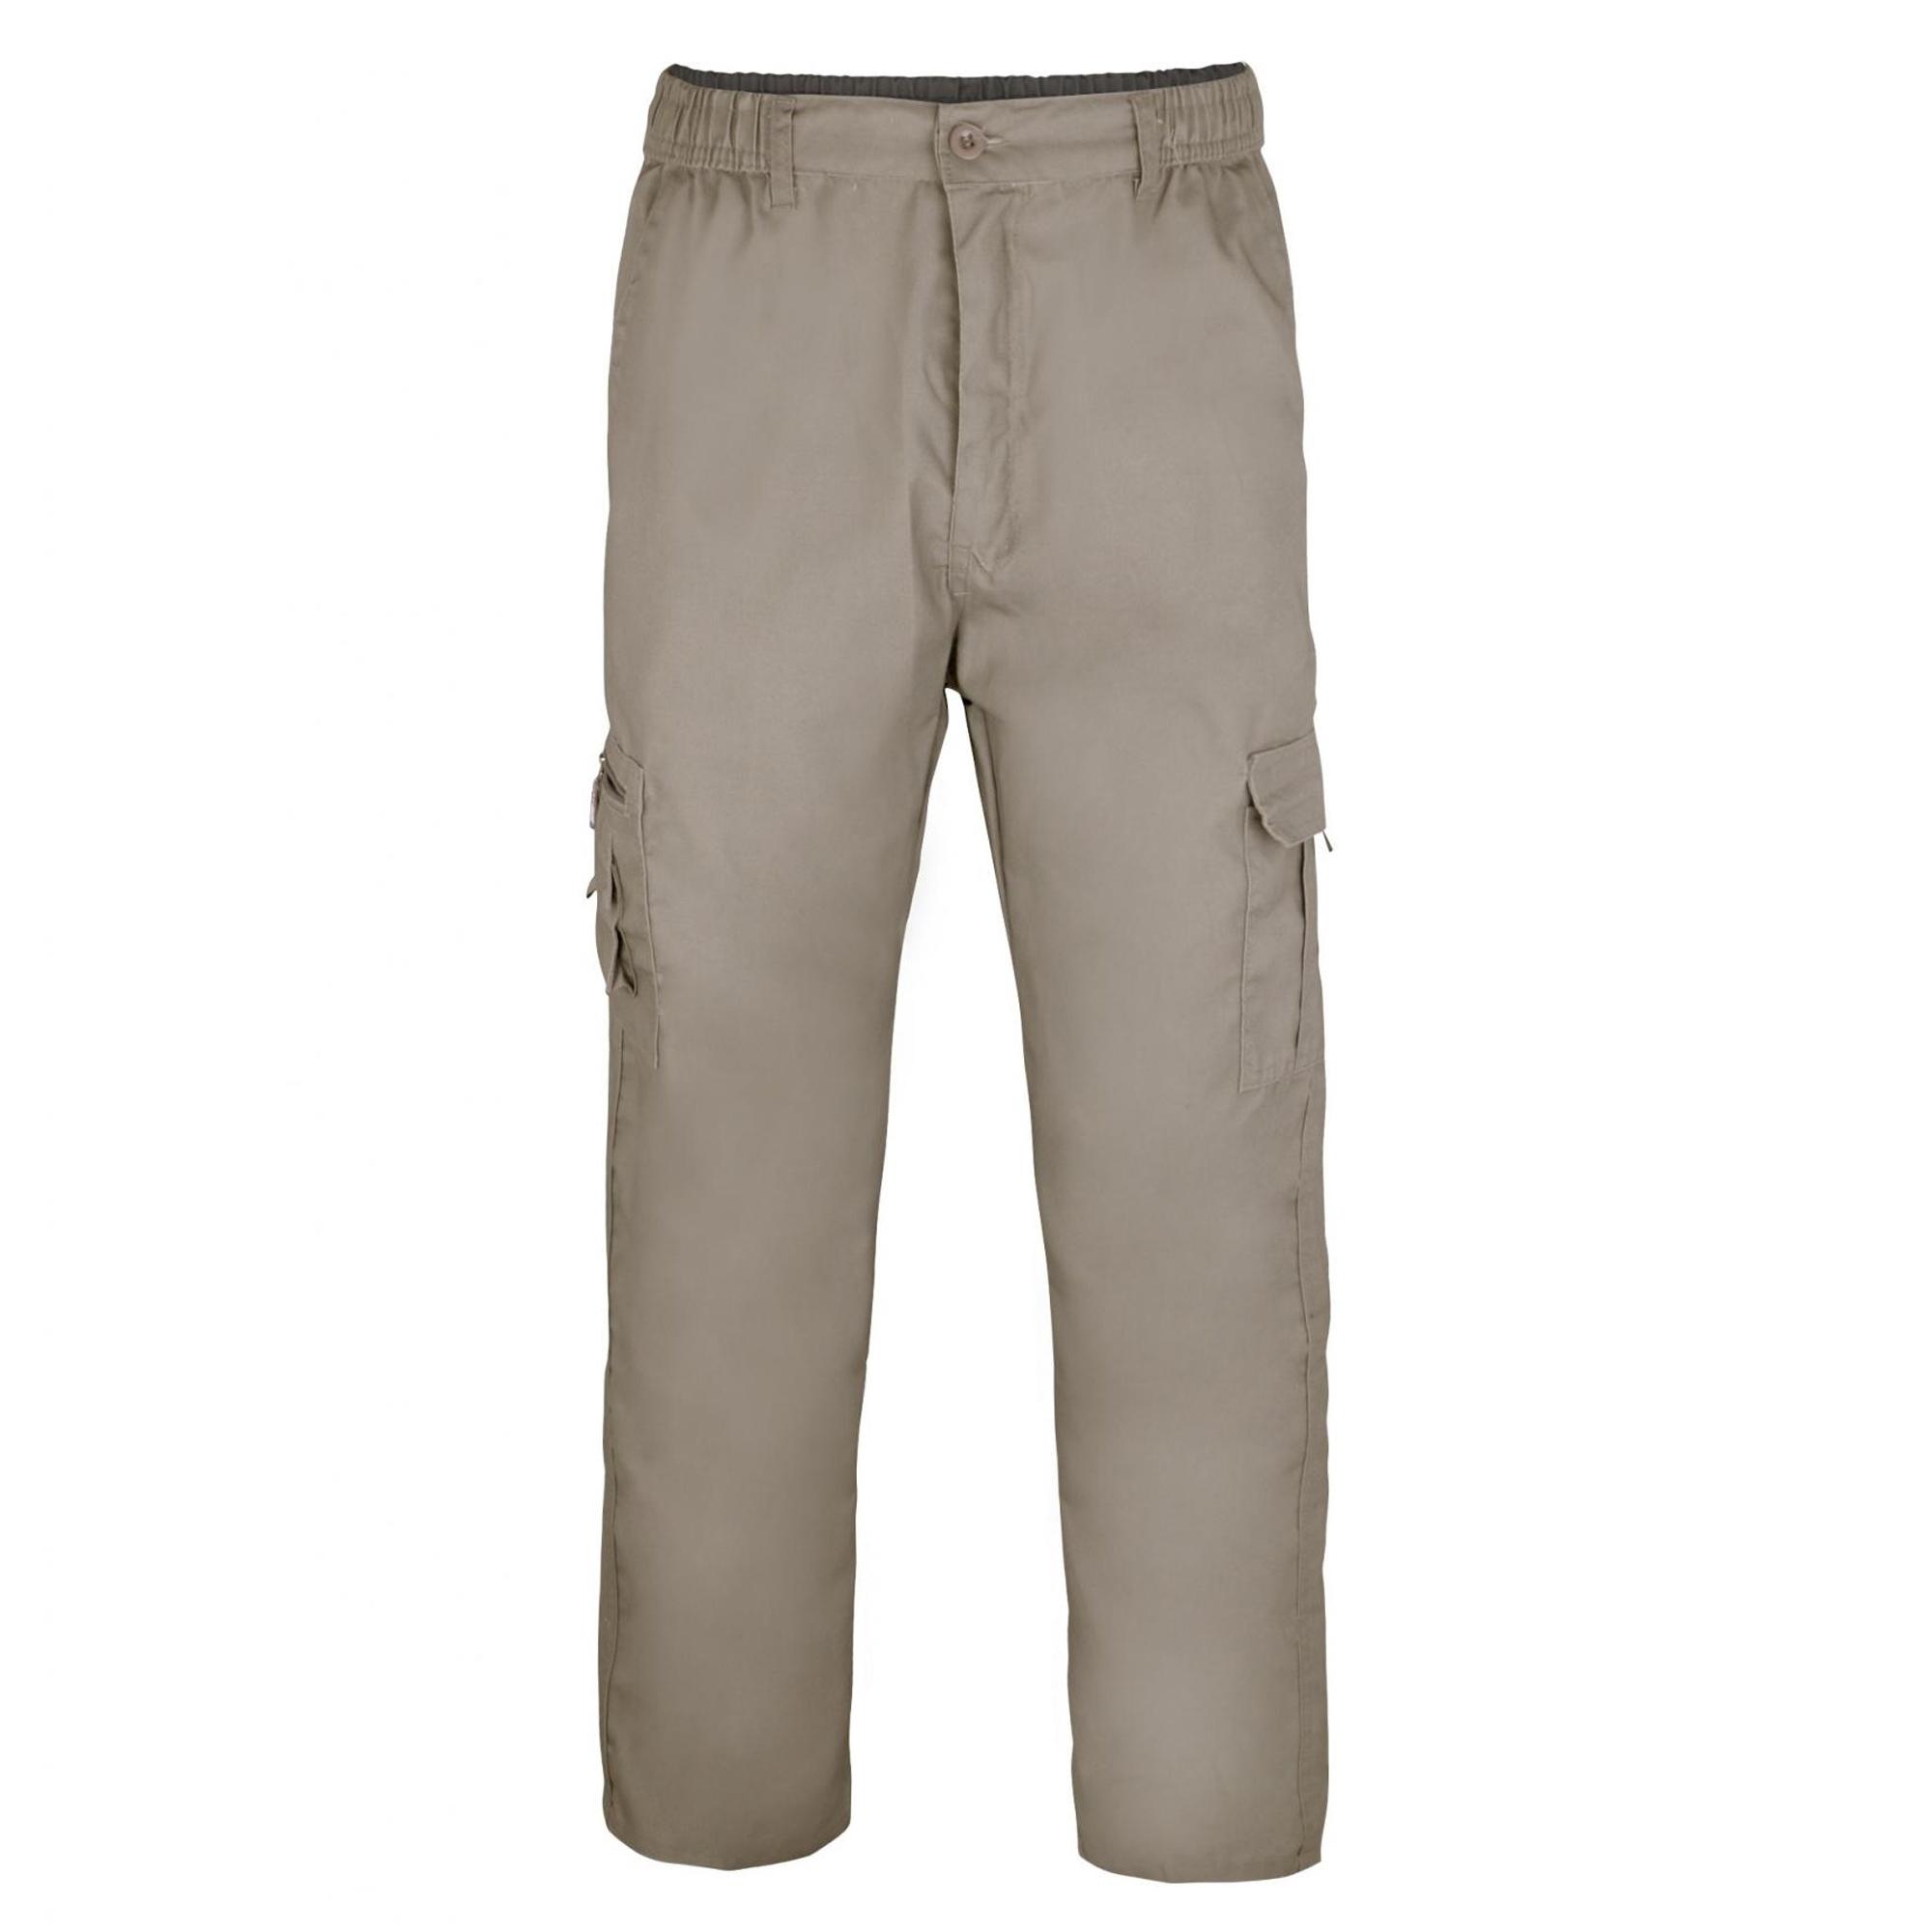 Krisp Mens Multi Pocket Cargo Trousers (M) (Taupe)